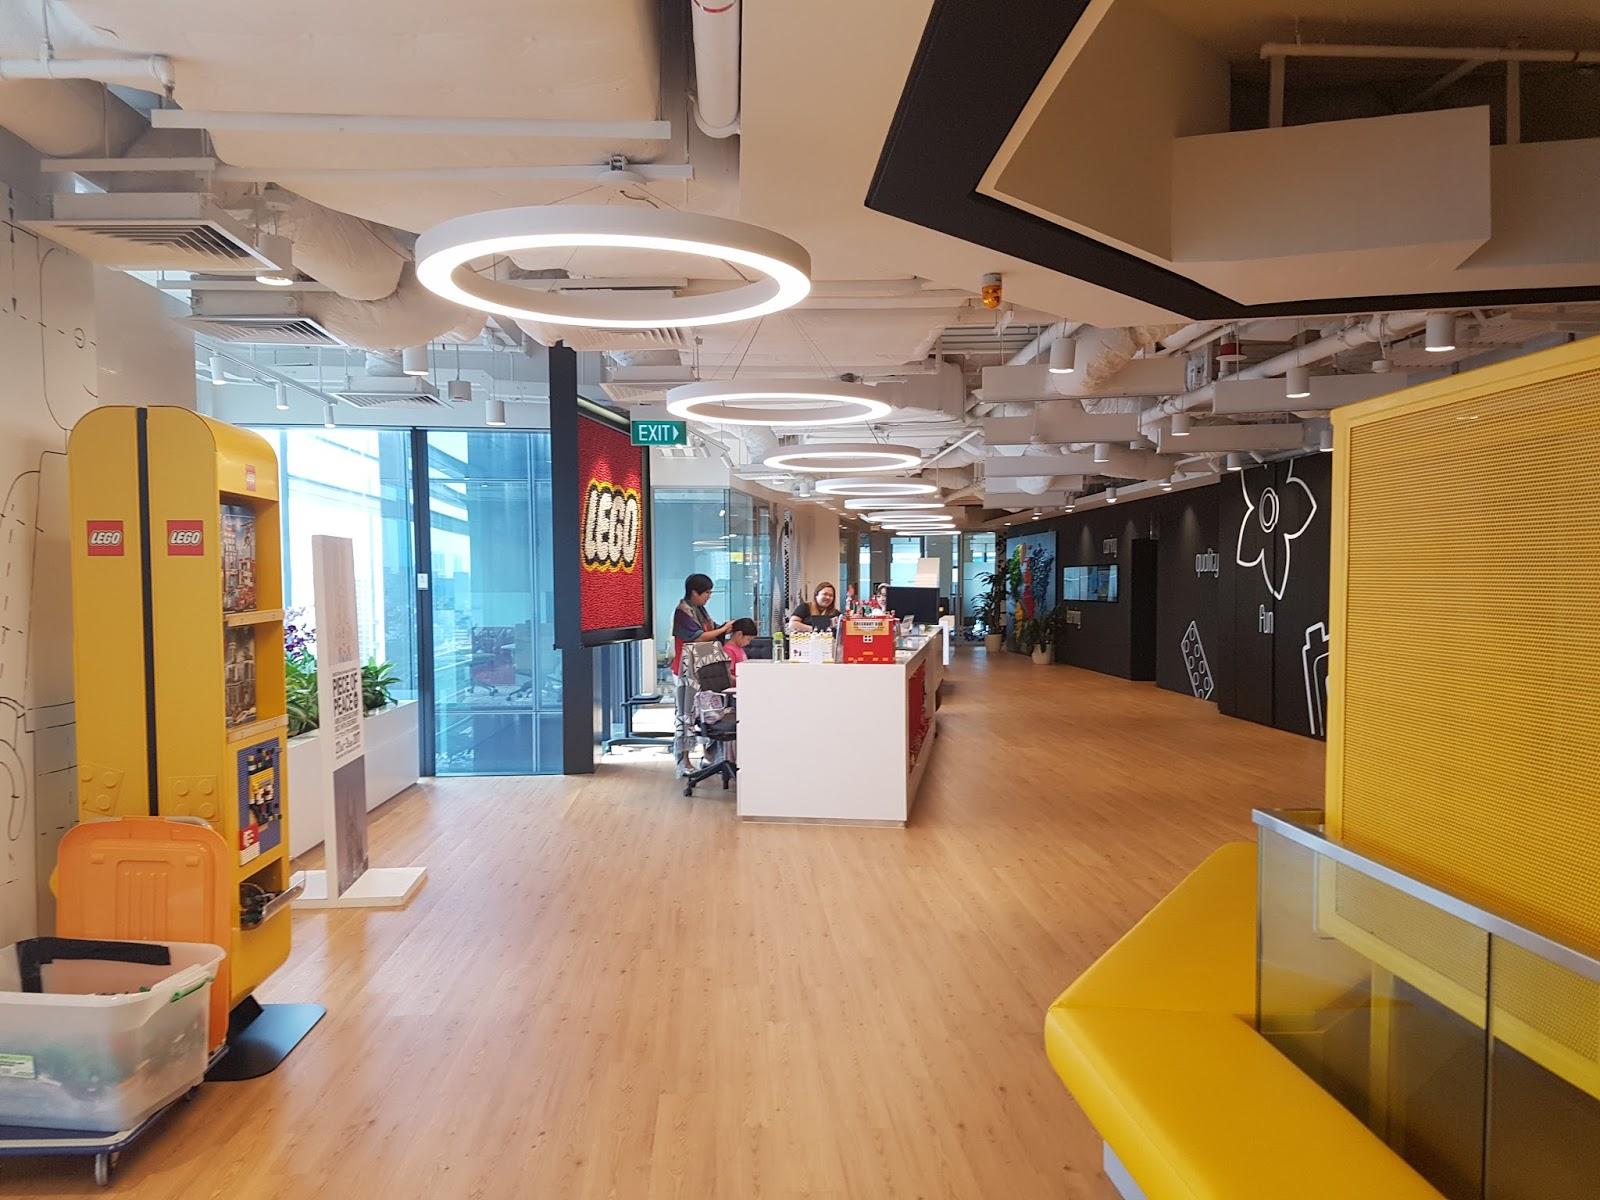 lego office. LEGO Singapore Office Tour! Lego